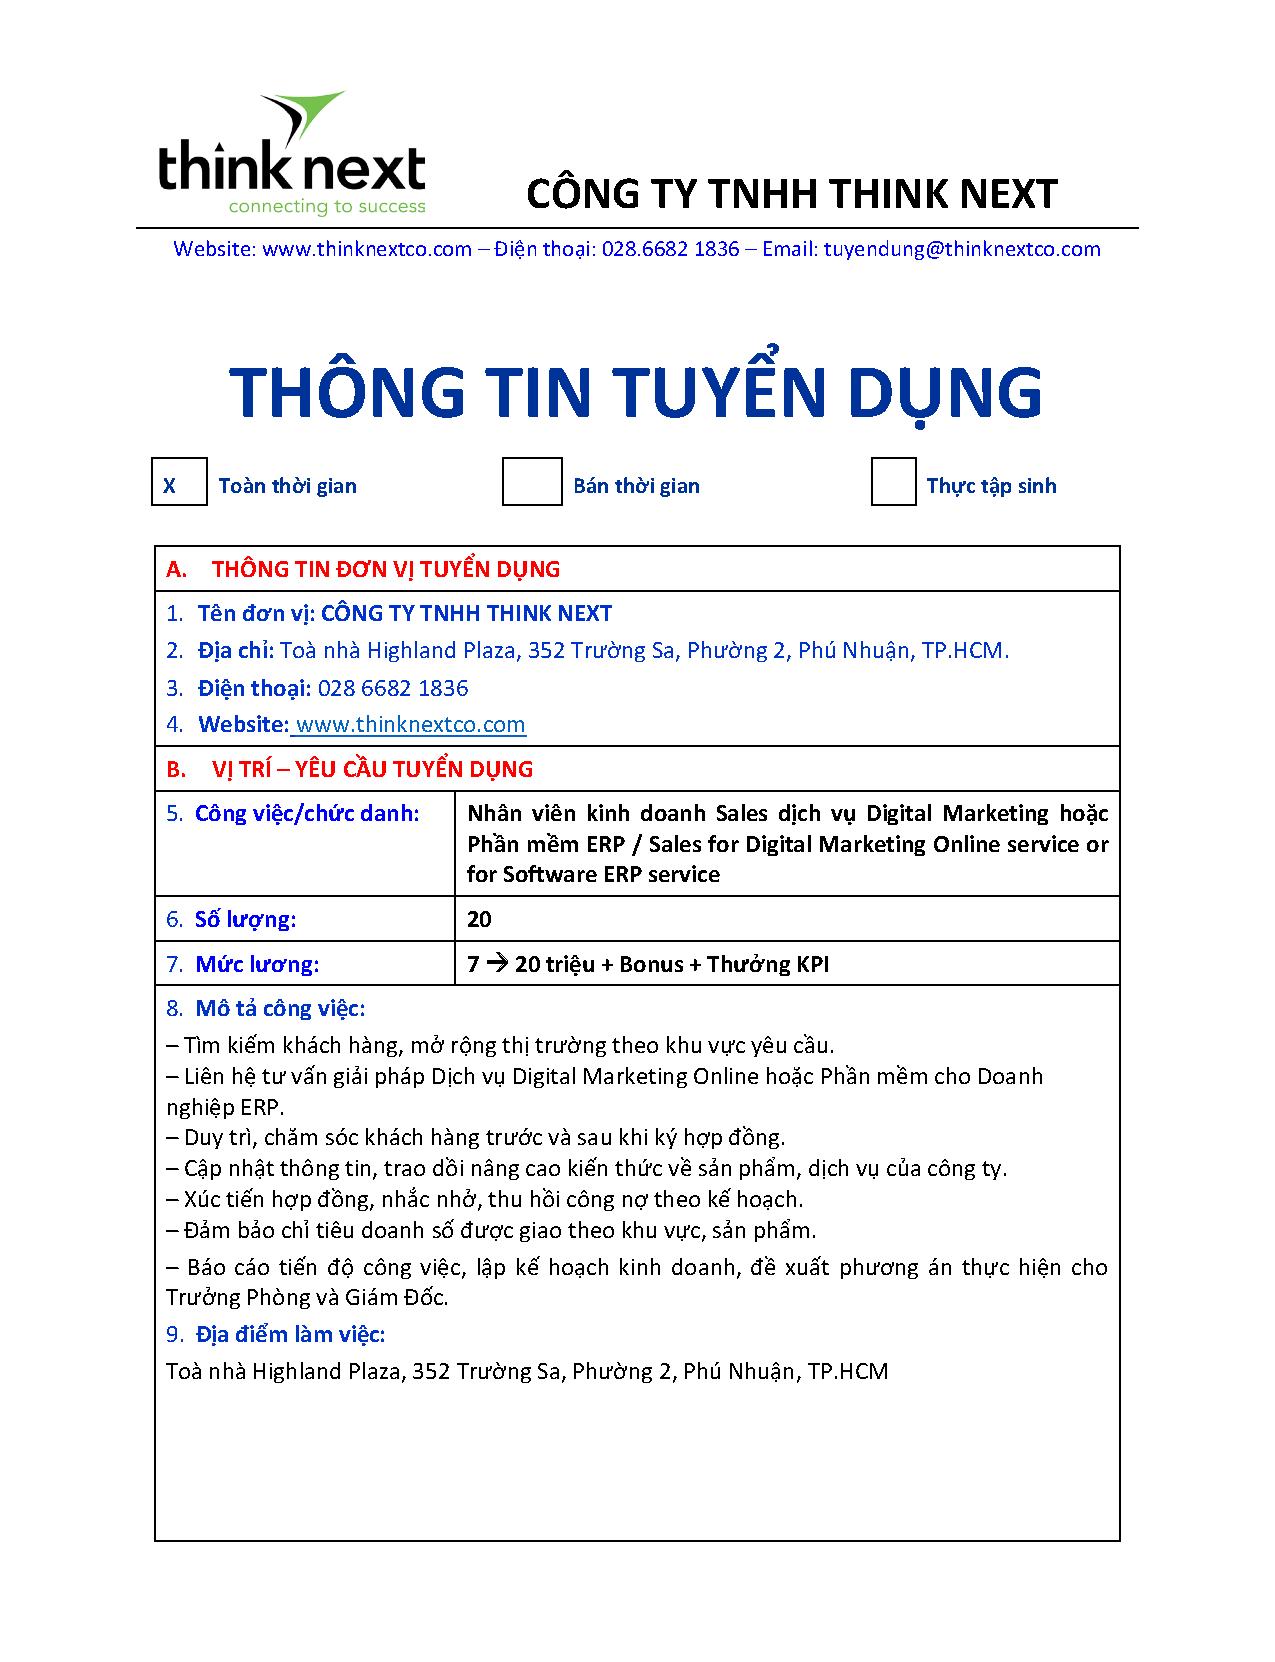 CTY THINK NEXT-THONG TIN TUYEN DUNG DOANH NGHIEP_Sales Digital & ERP_Page_1